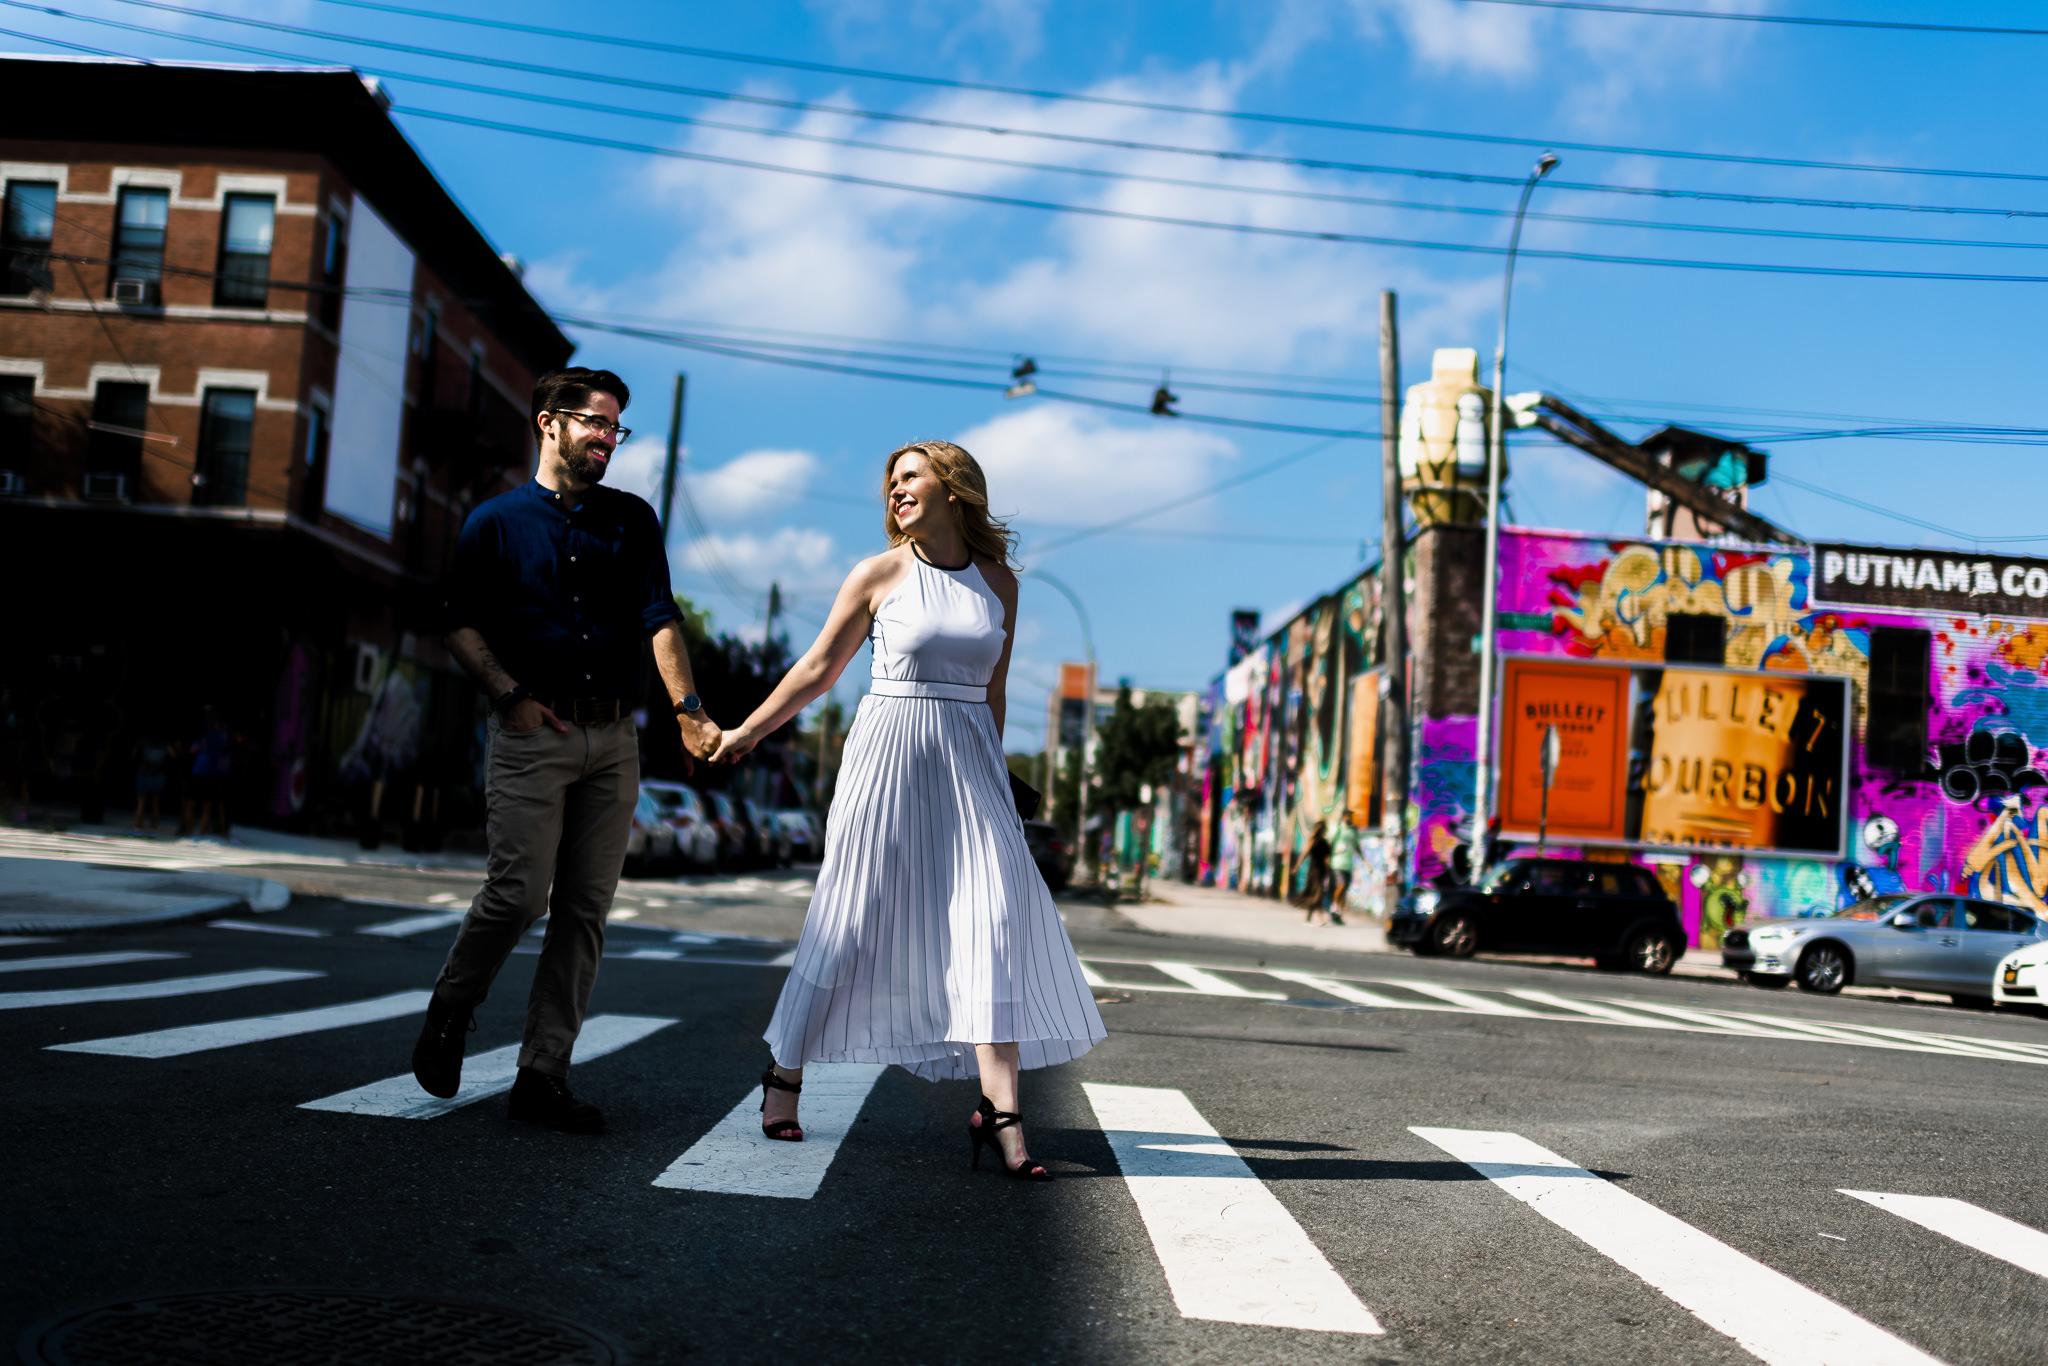 Arena-Brooklyn-New-York-Engagement-Photos-07.jpg